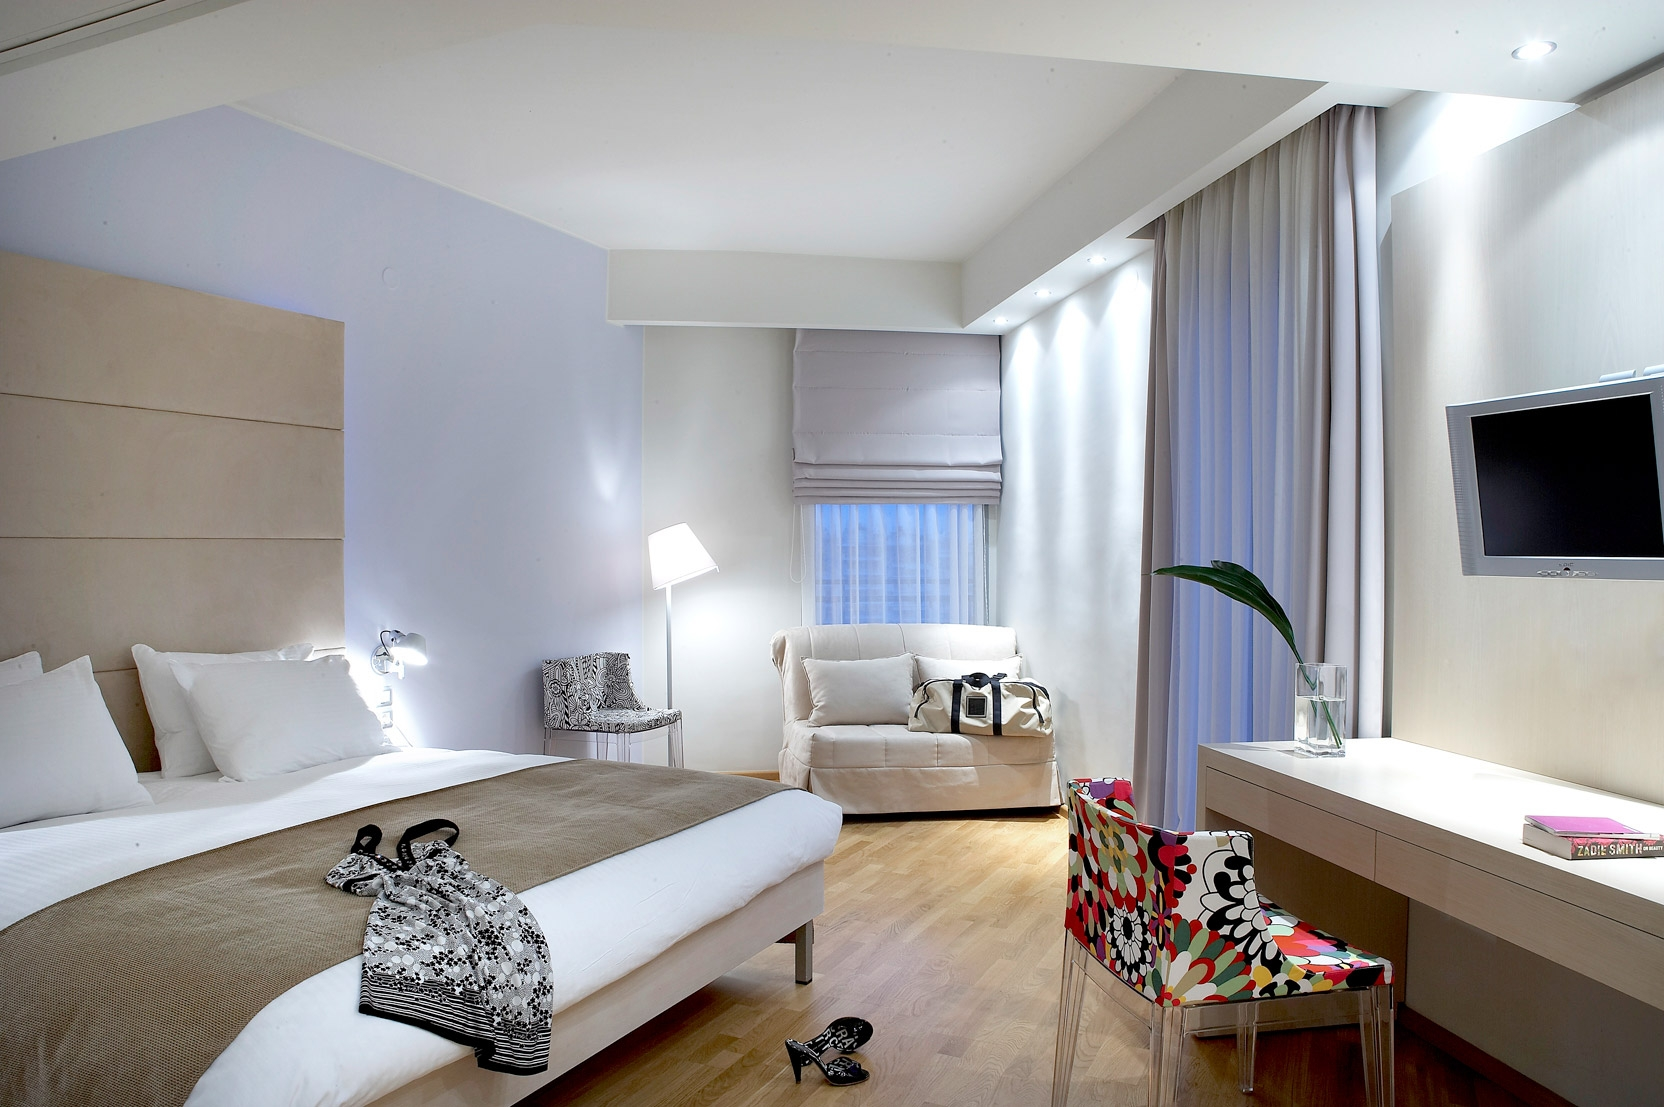 Olympia Hotel Thessaloniki - Θεσσαλονίκη   -23%   2 Ημέρες (1 Διανυκτέρευση)   2 άτομα   Ημιδιατροφή   έως 30/11/2019   <strong>Του Ομίλου Domotel!</strong>